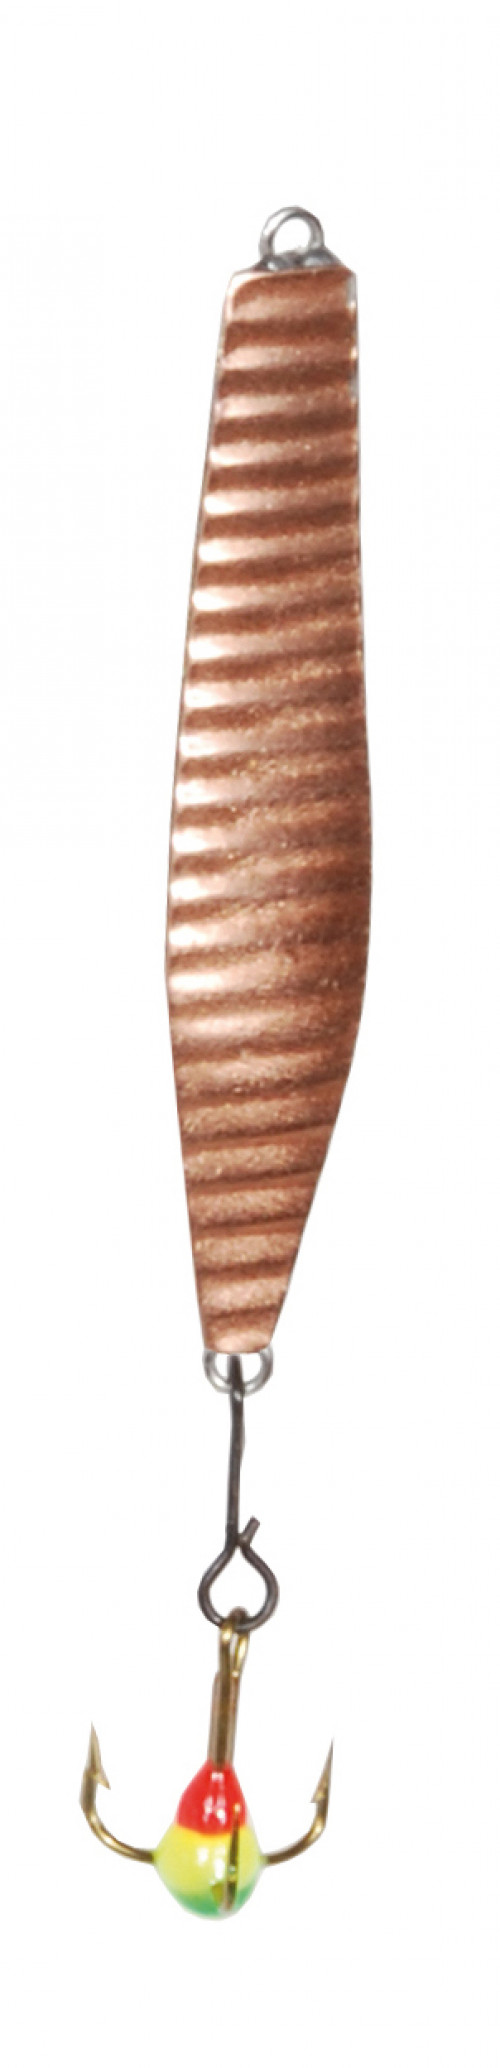 Wiggler Vickepirken 37mm 5g Räfflad